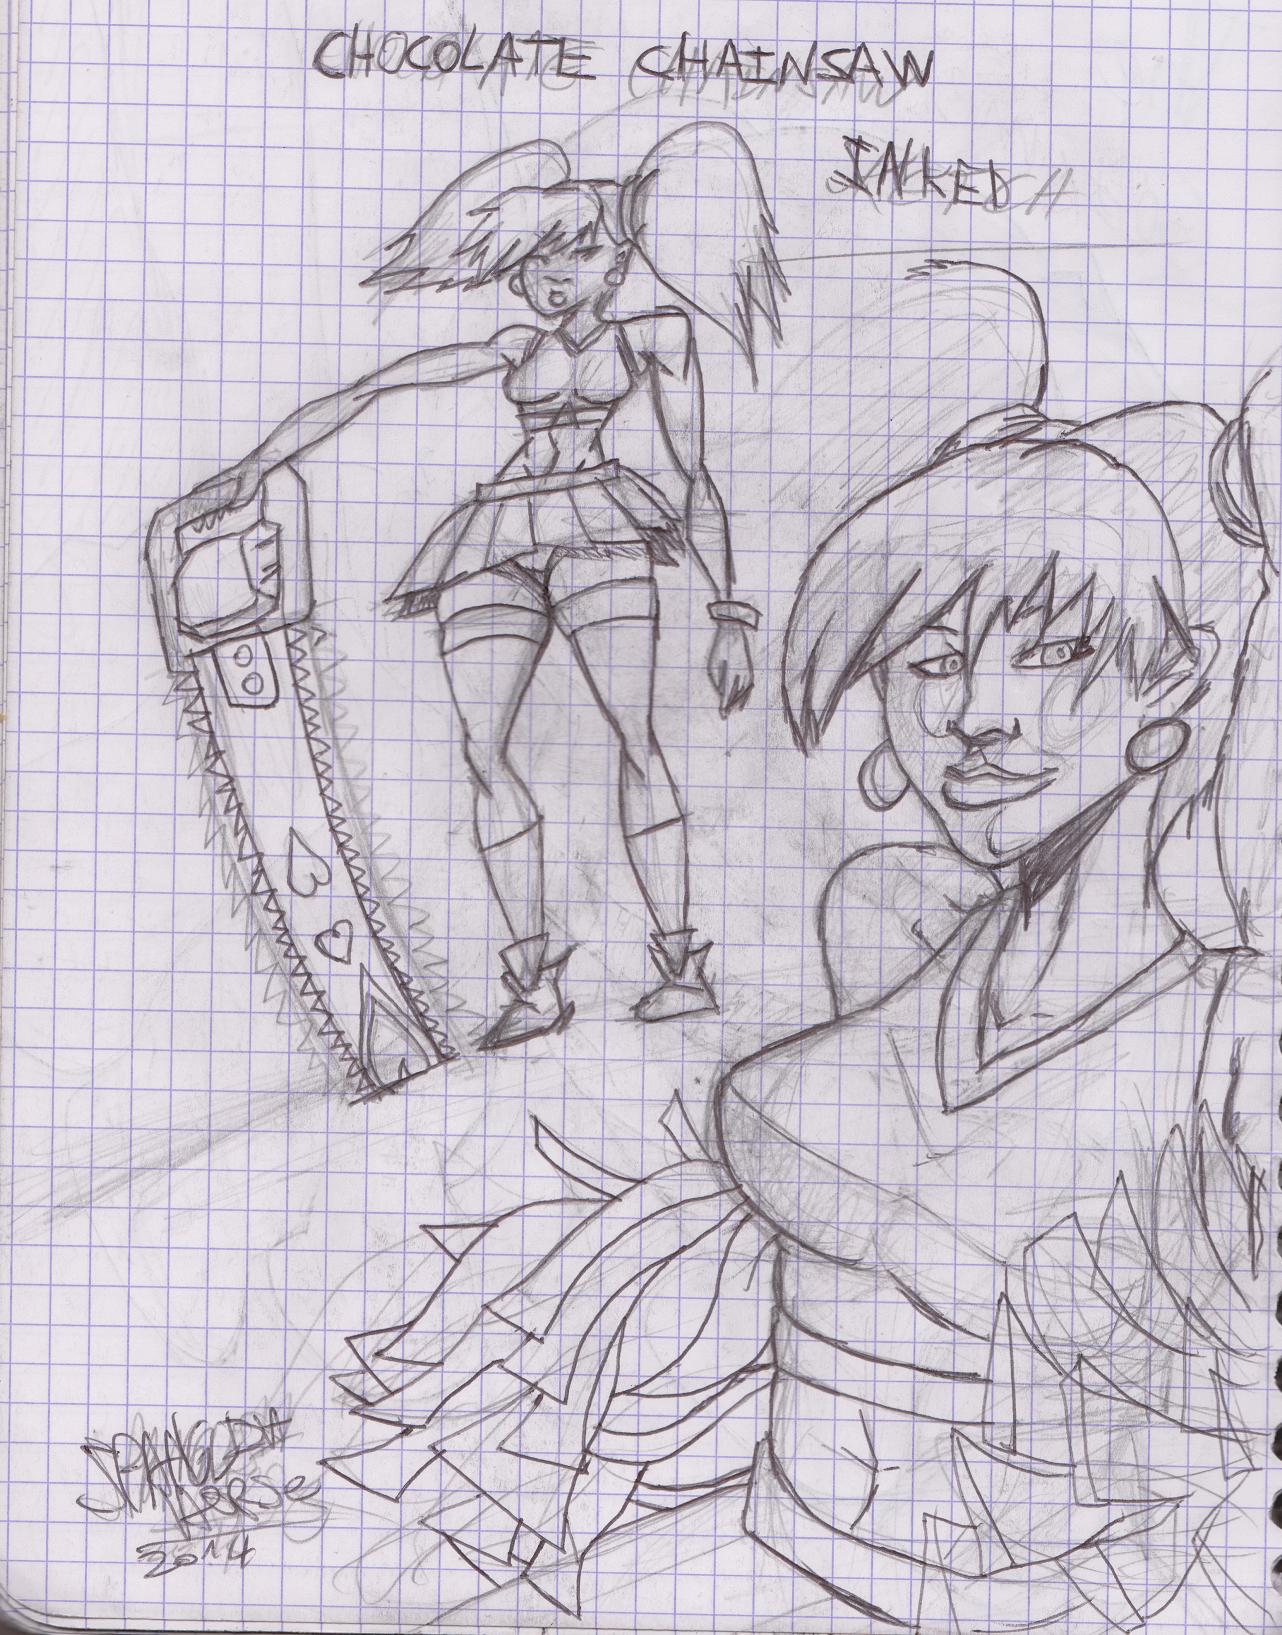 SH sketchbook page 28